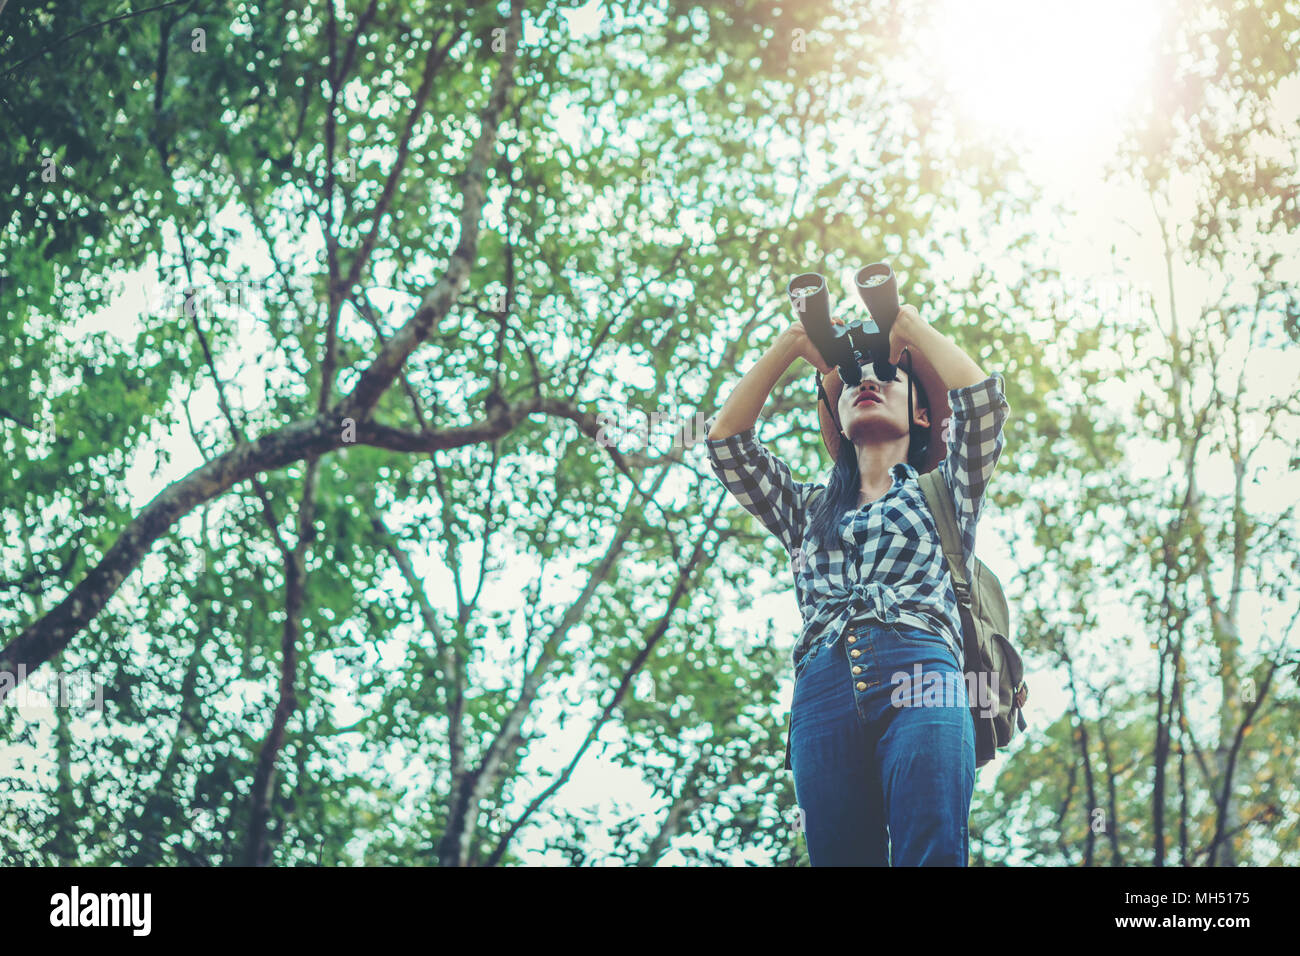 Minox bf fernglas neues modell neuware pirschglas jagd